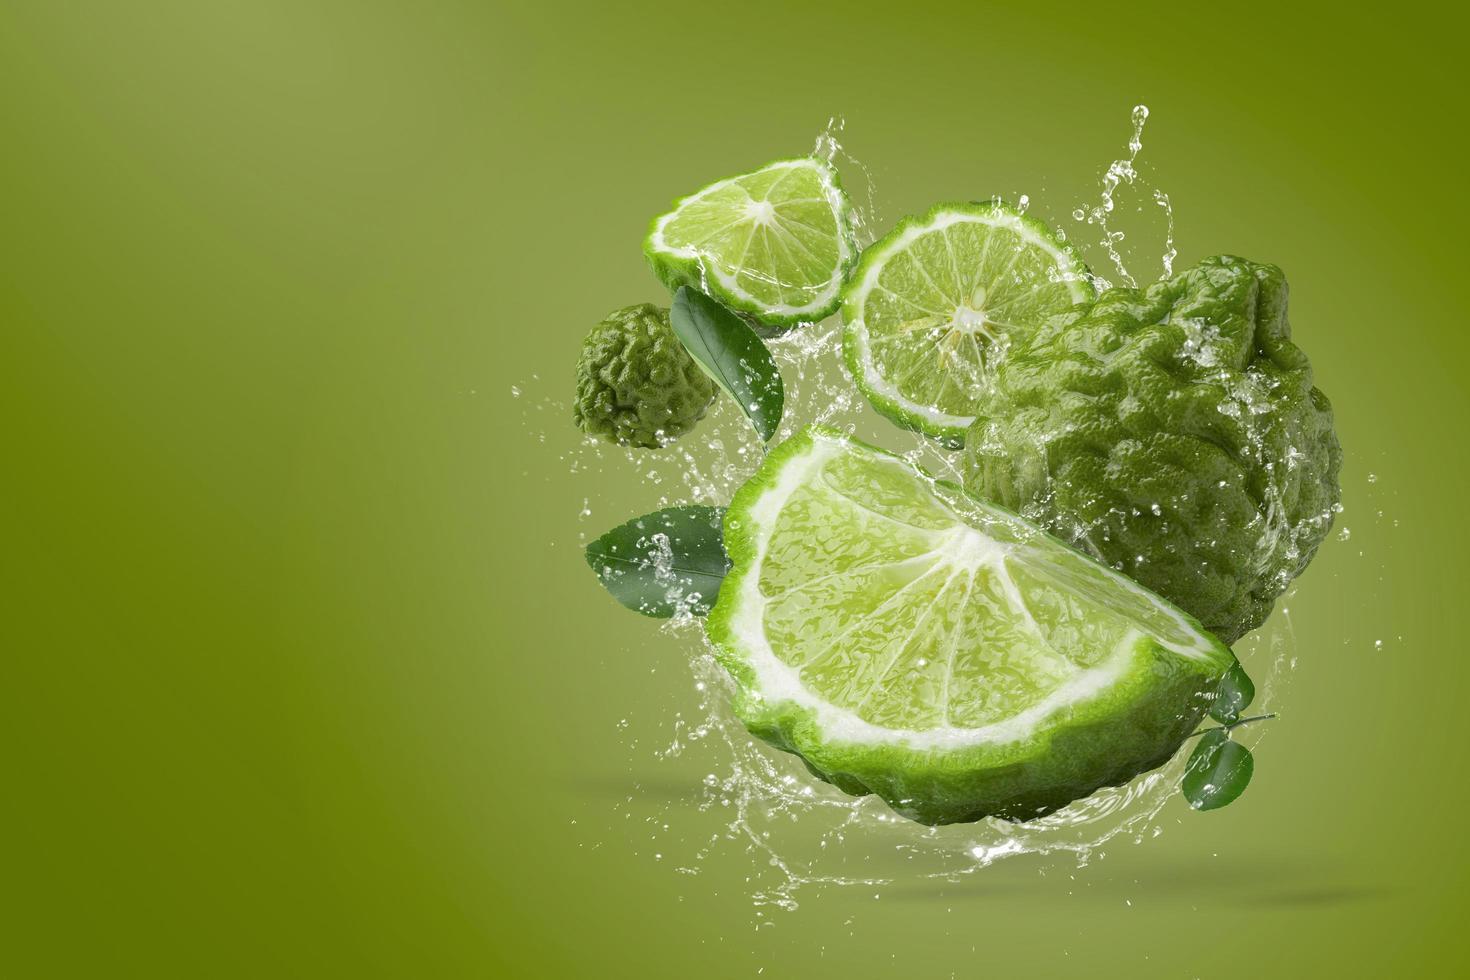 Water splash on bergamot fruit  photo